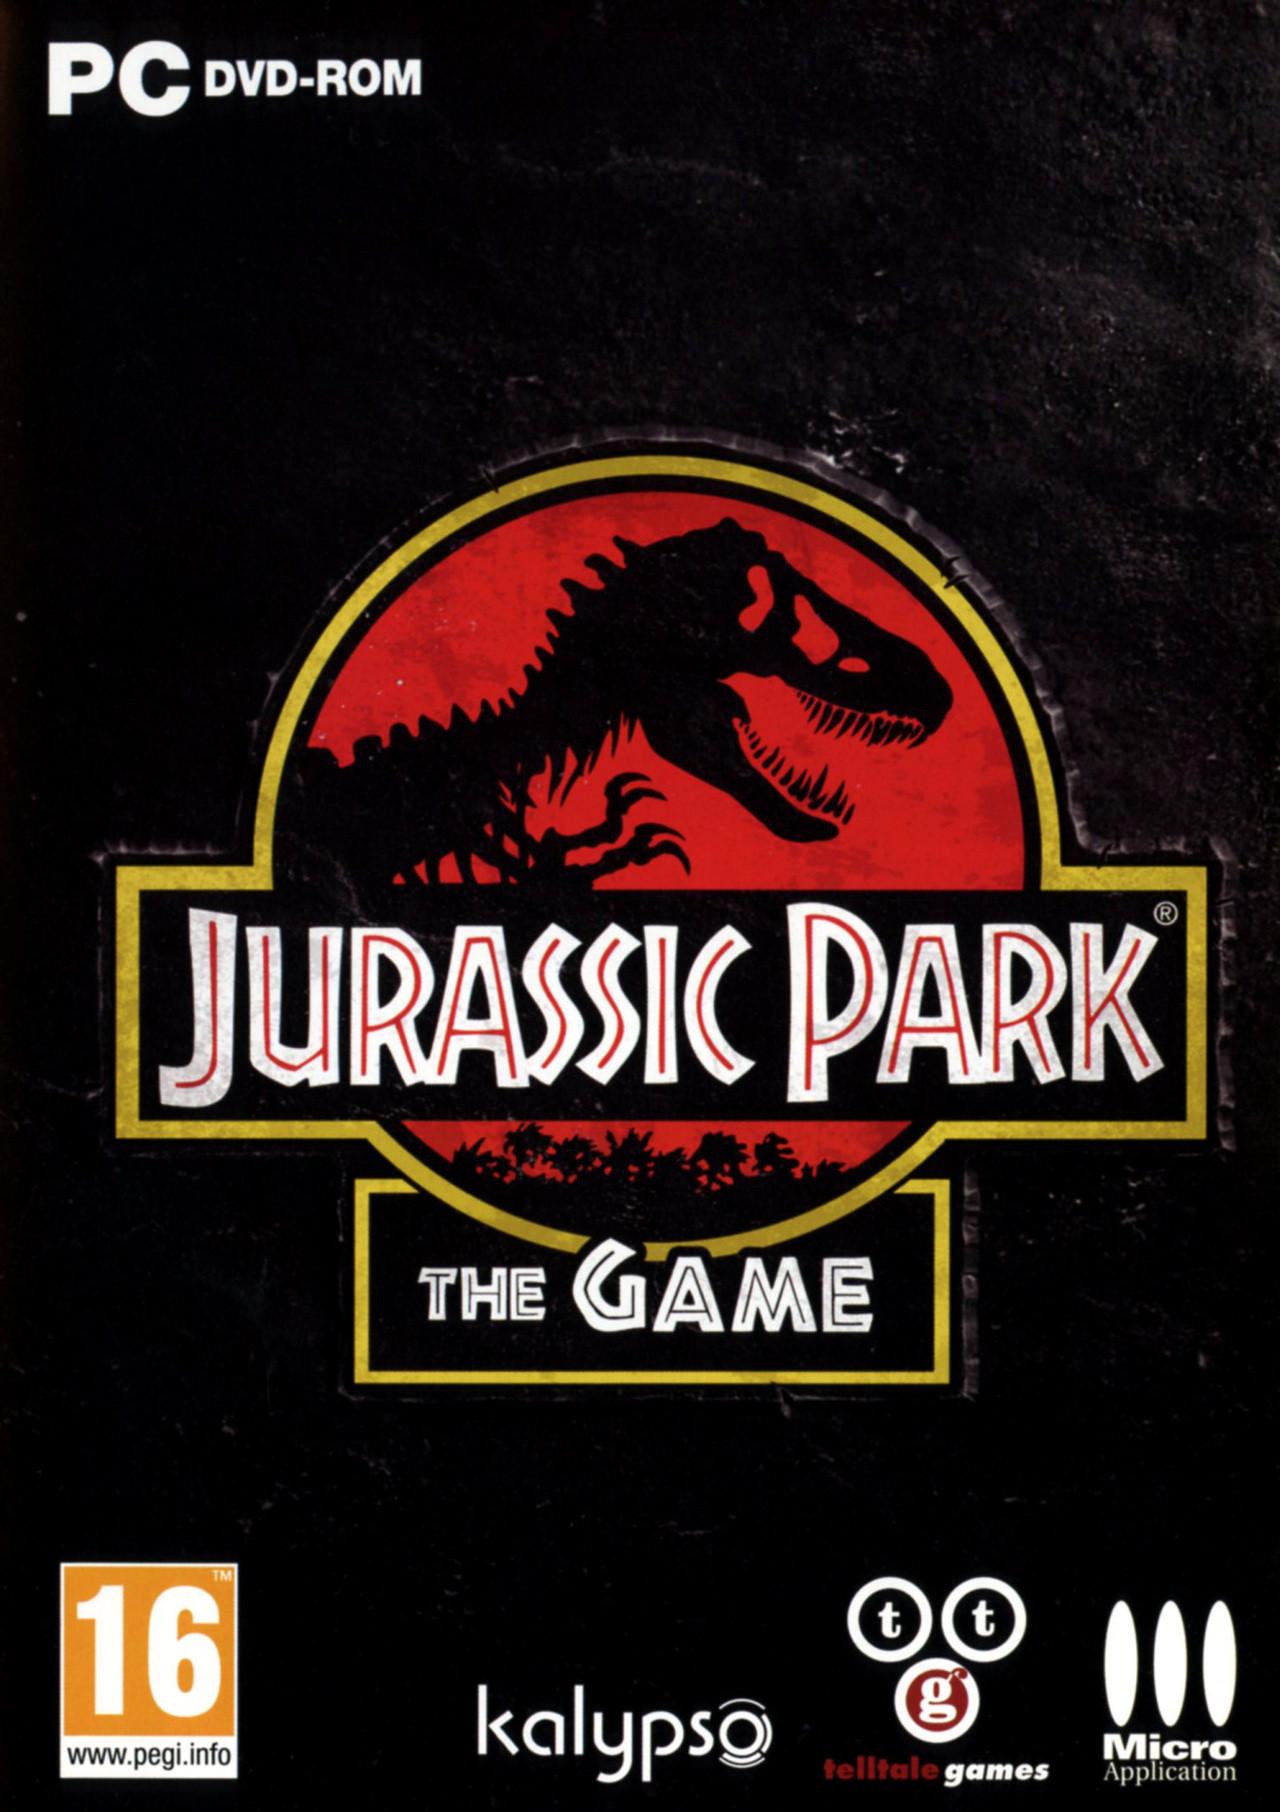 jaquette-jurassic-park-the-game-pc-cover-avant-g-1332162958.jpg